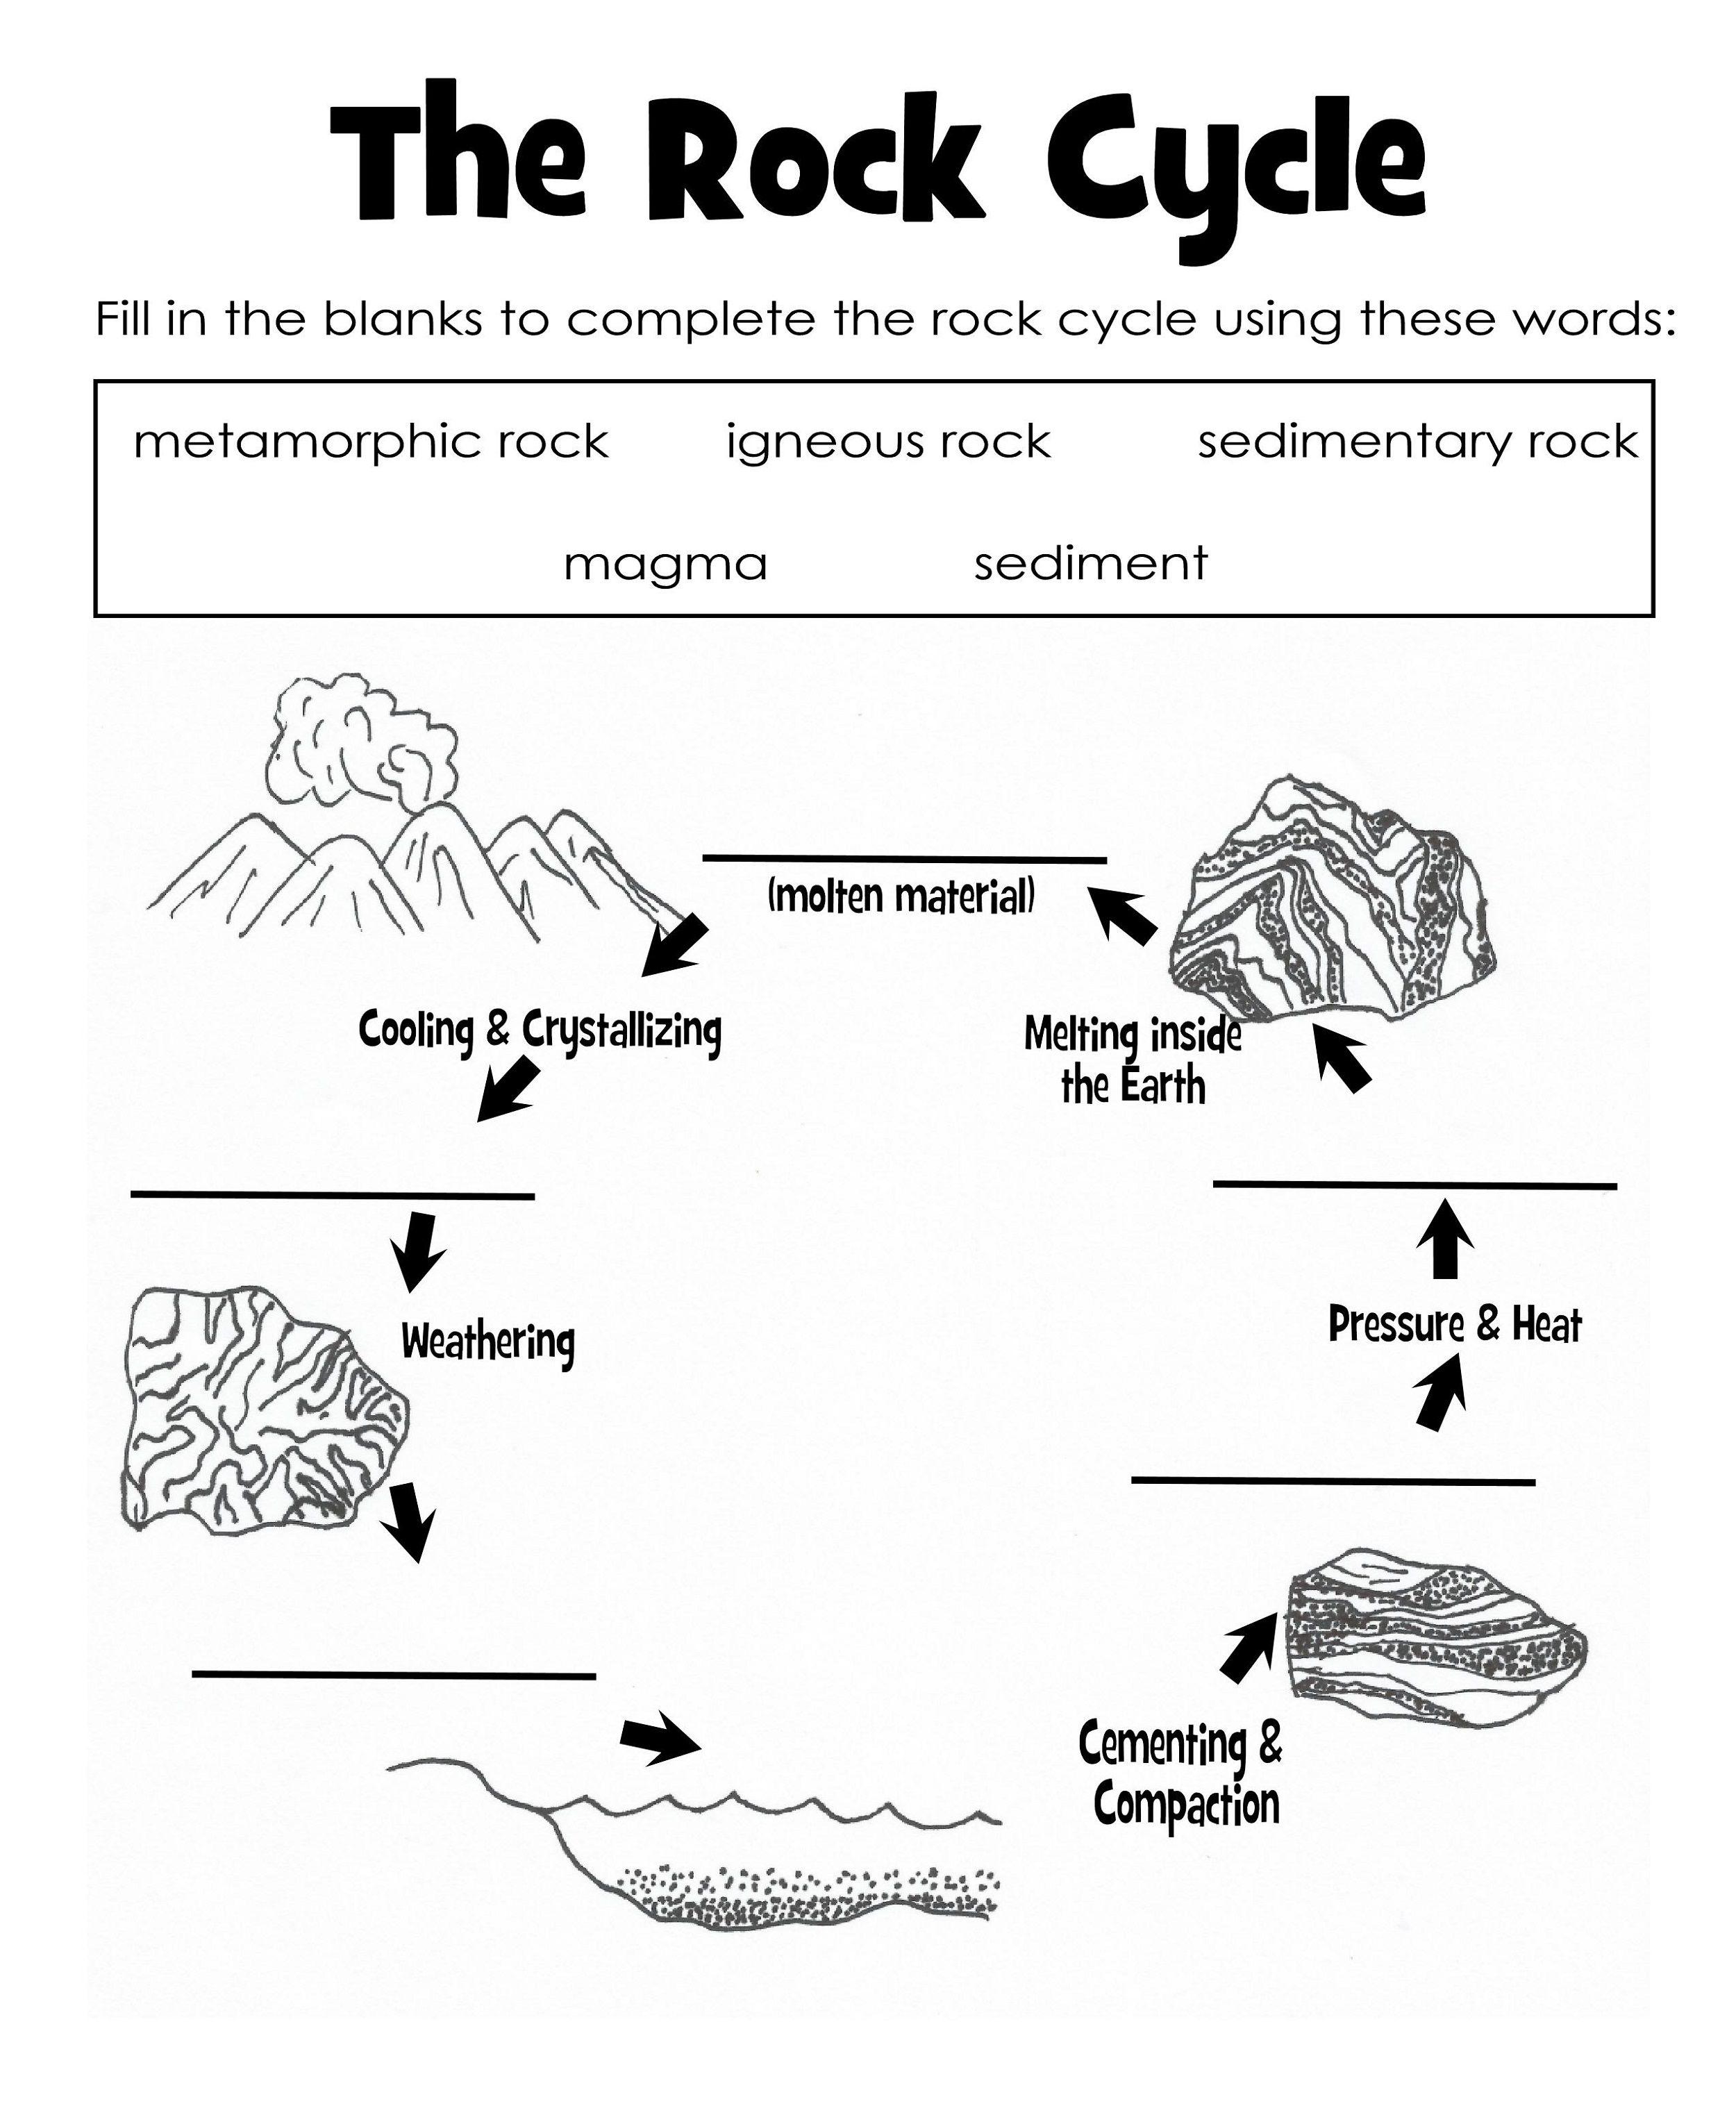 The Rock Cycle Diagram Worksheet Label   Science Printable For Kids   Rock Cycle Worksheets Free Printable